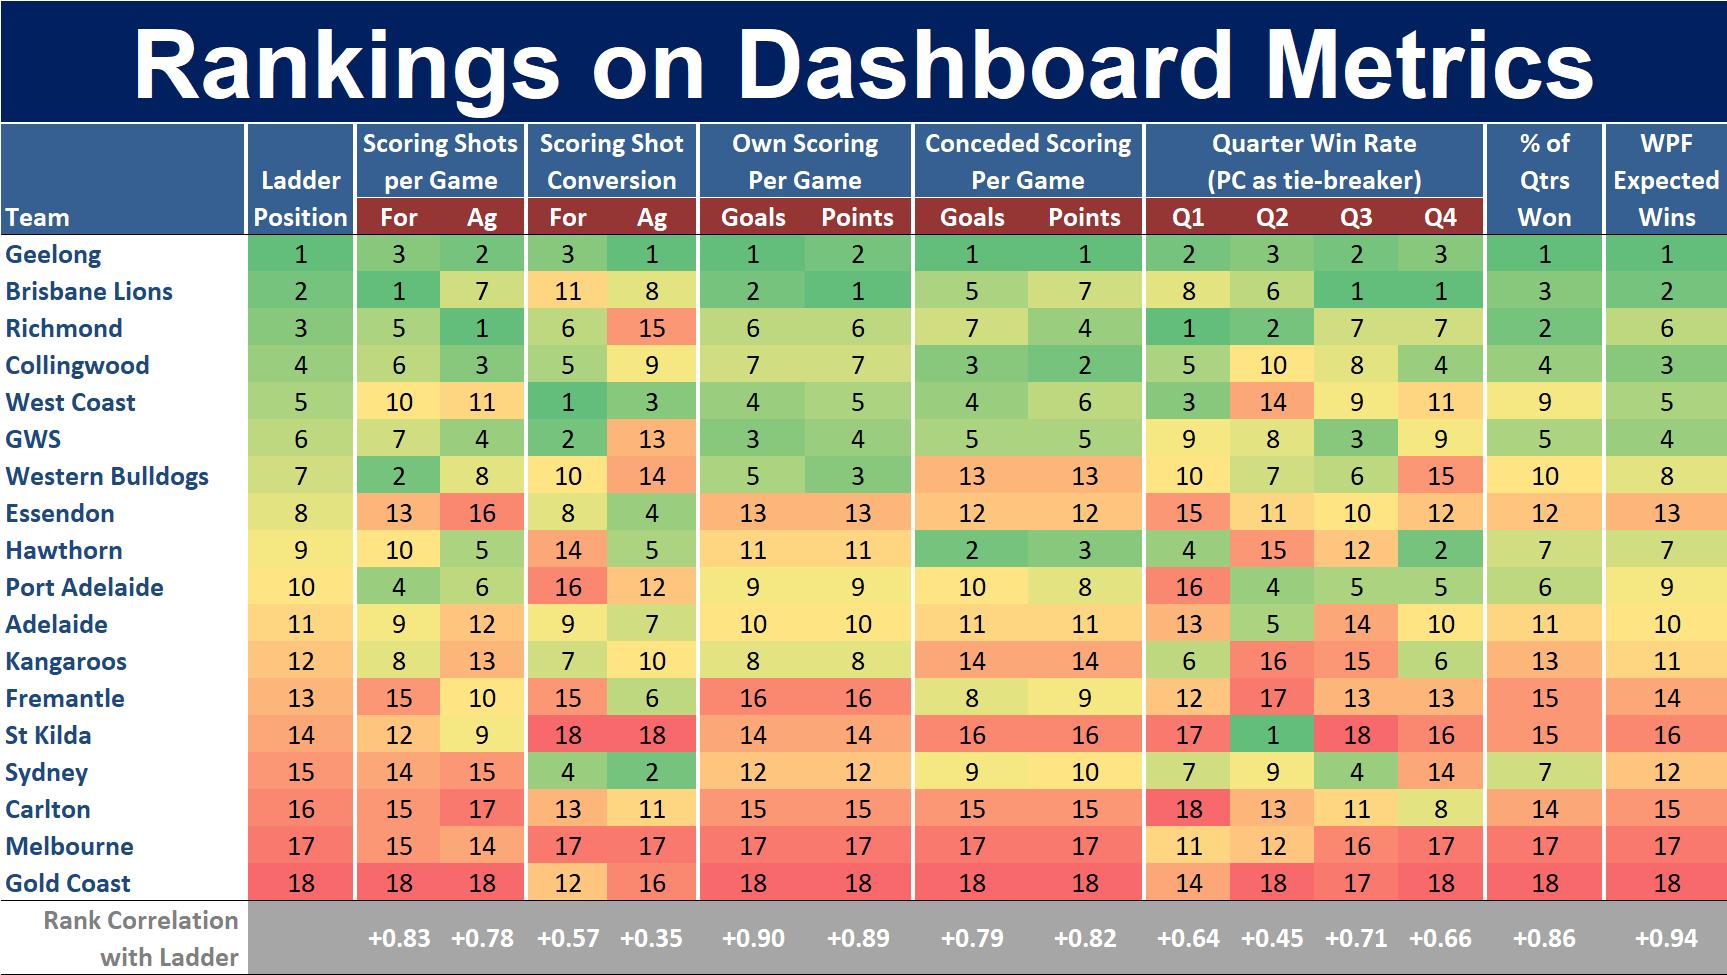 R23 - Ranking on Dashboard Metrics.png